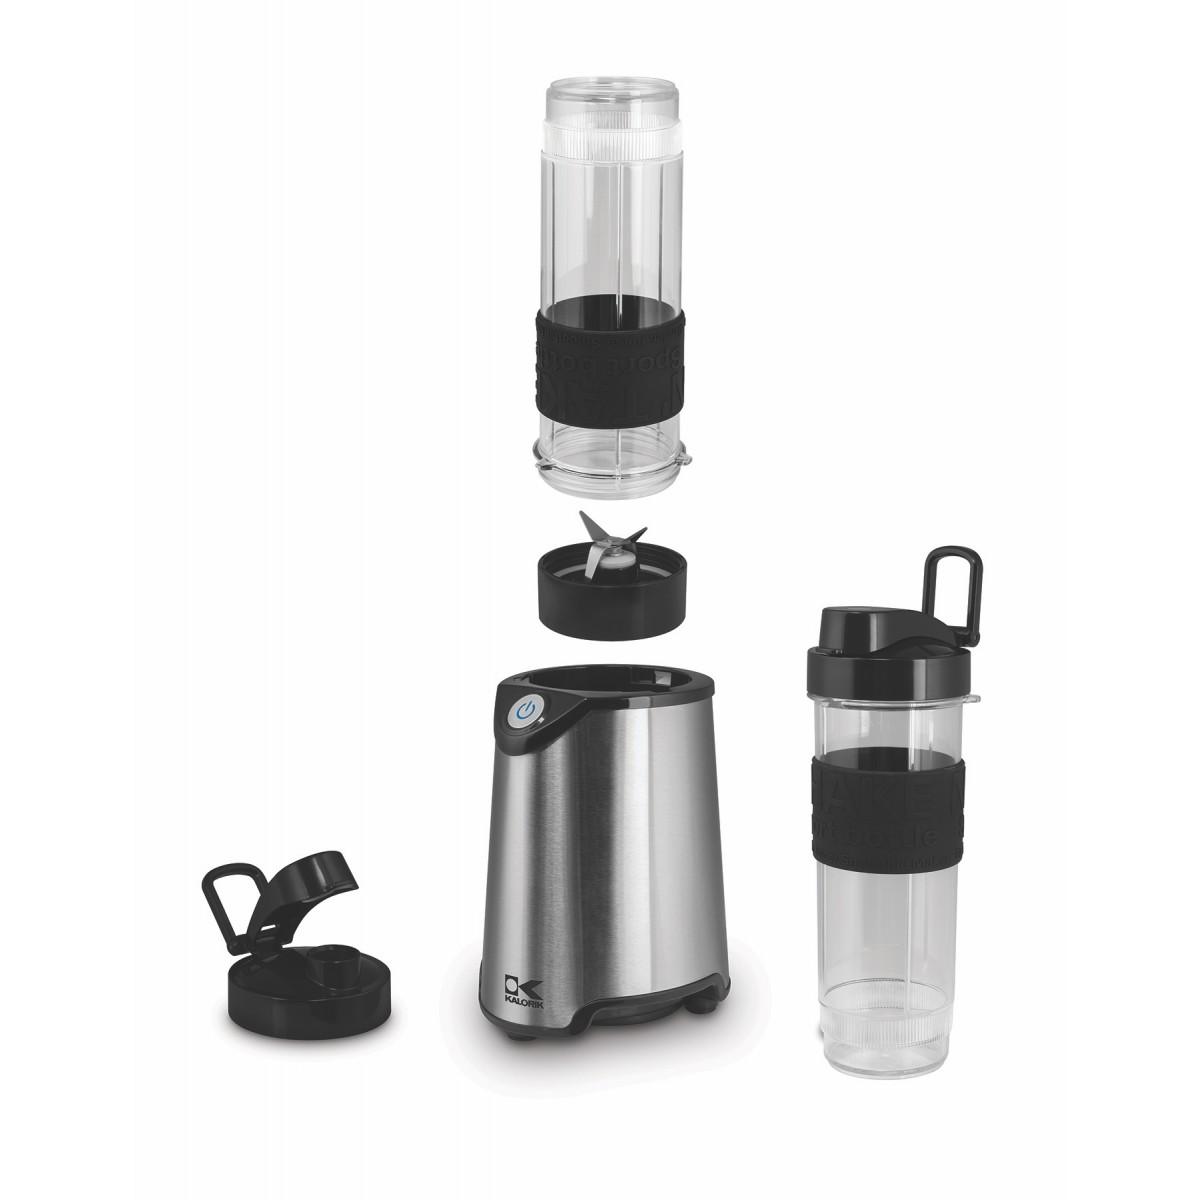 Kalorik Home and Kitchen Stainless Steel Personal Sport Multipurpose Blender - Black